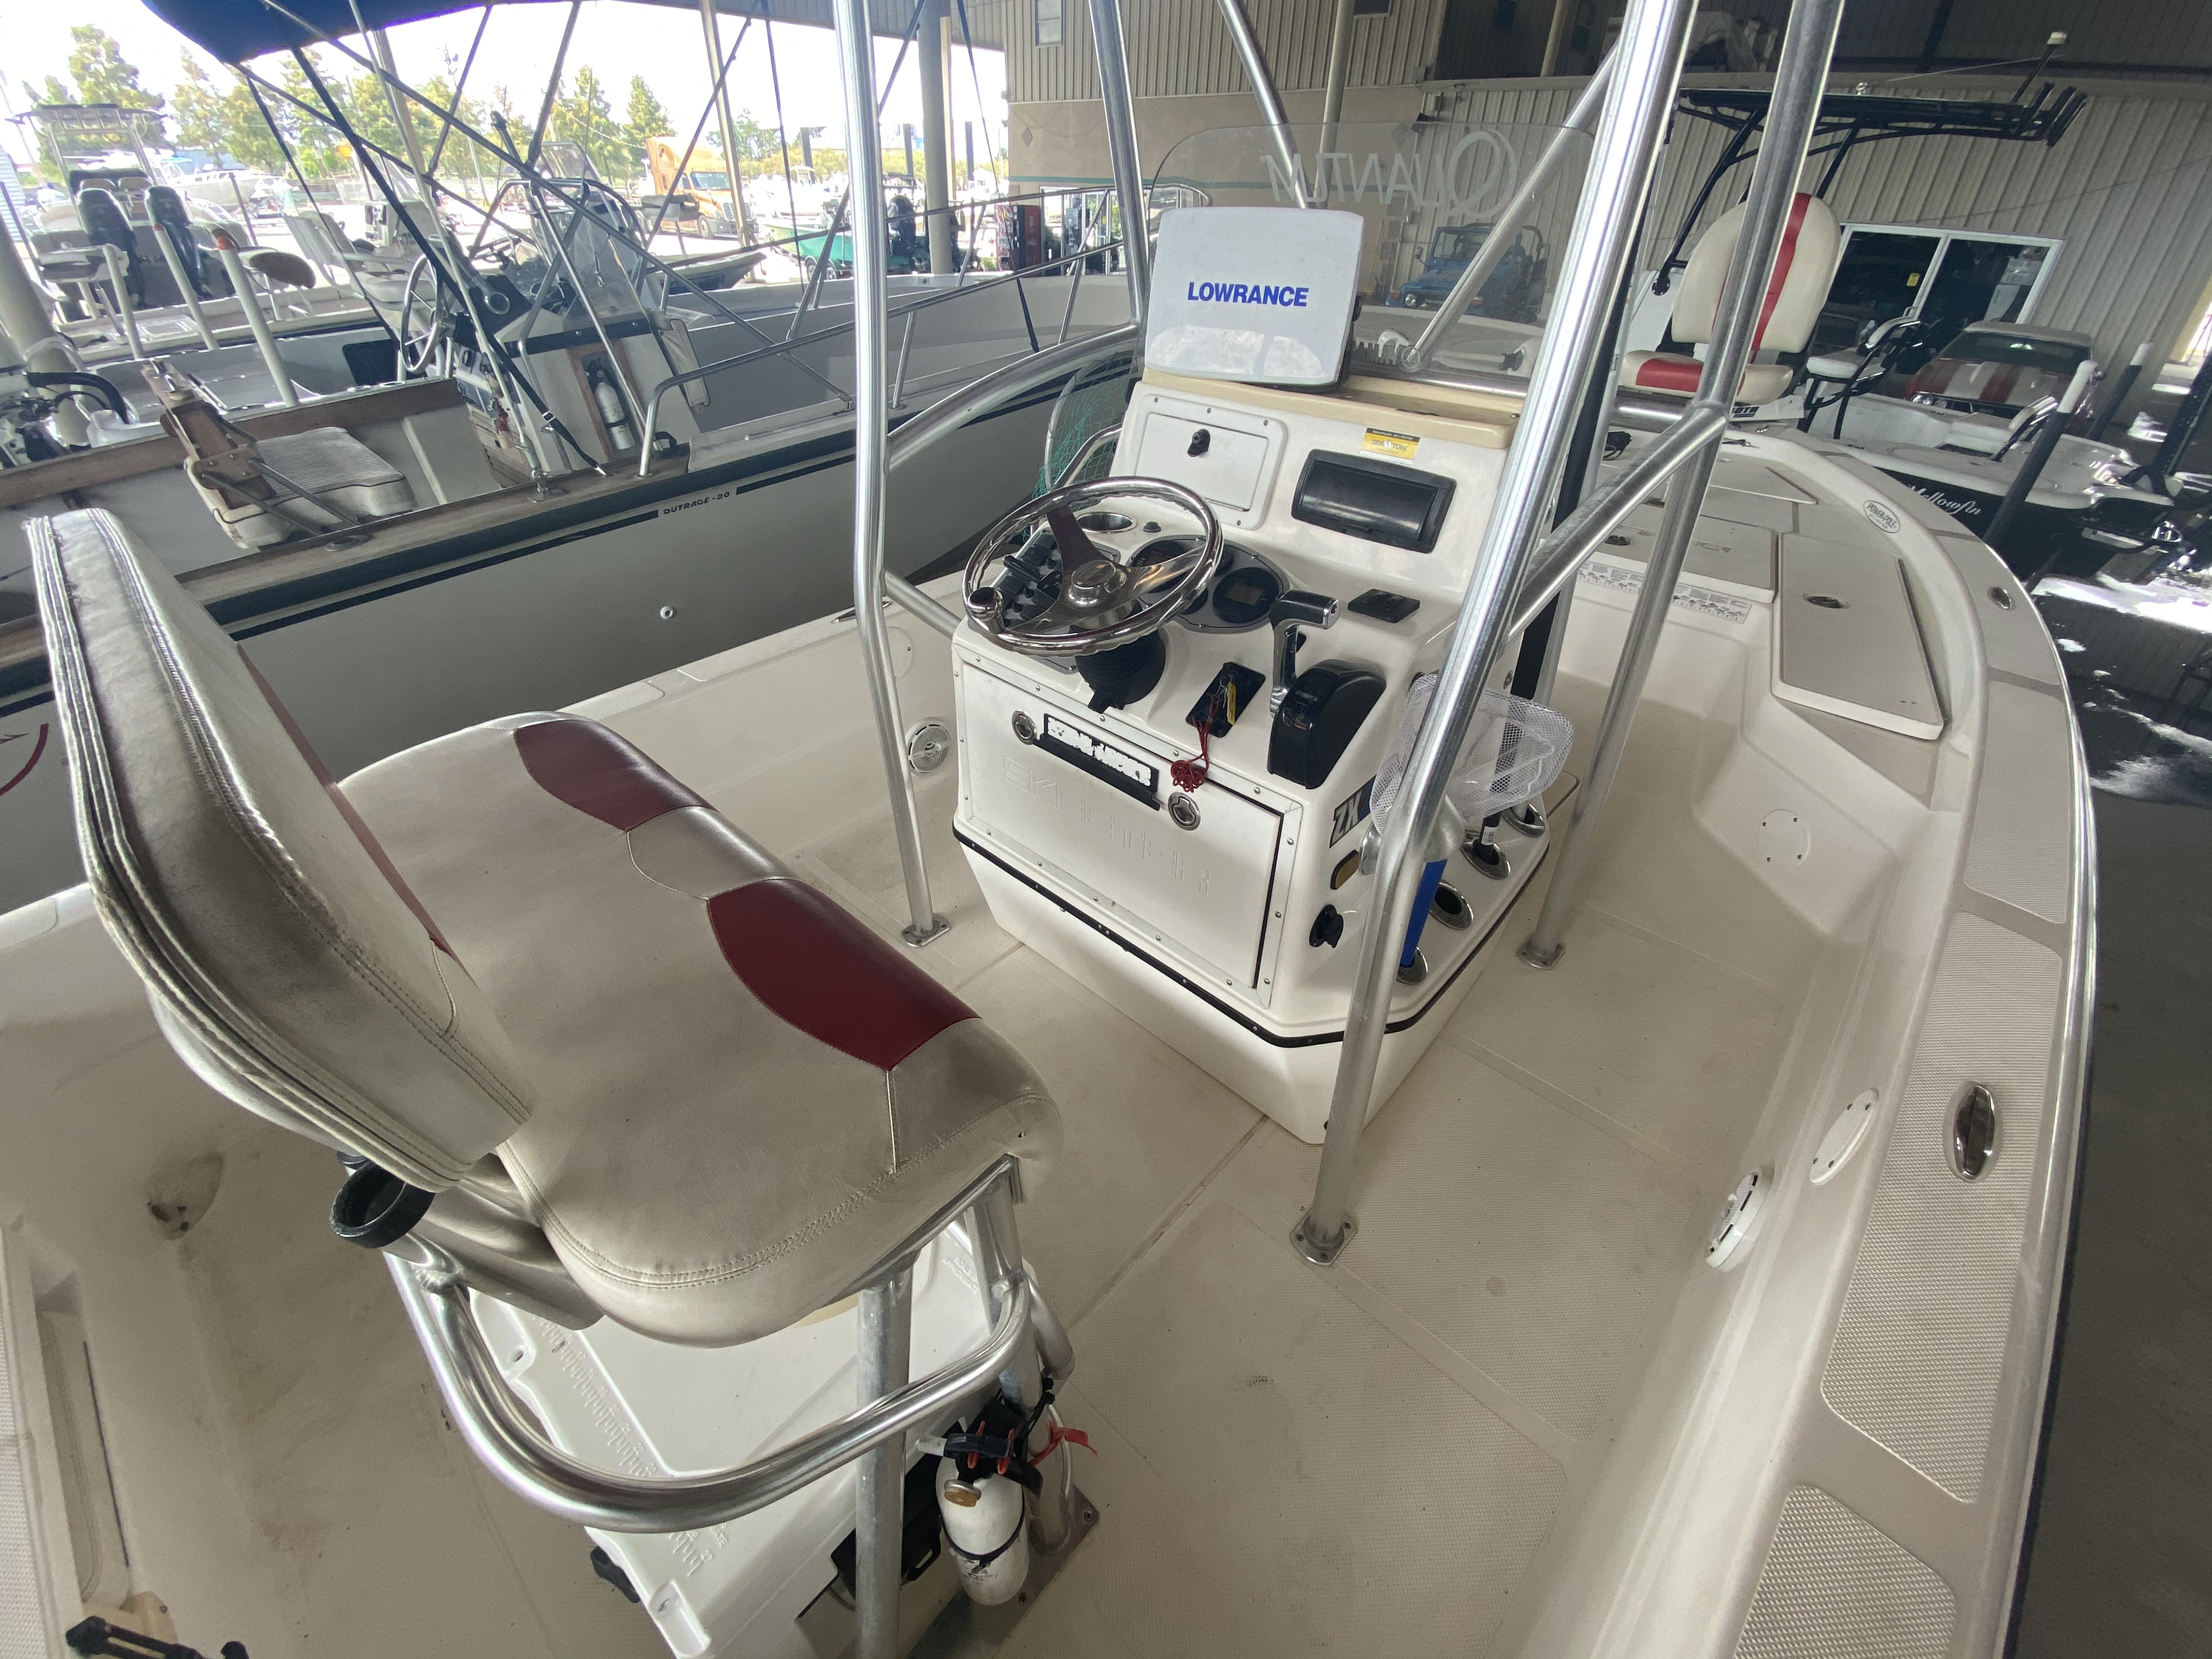 2010 Skeeter boat for sale, model of the boat is ZX24V & Image # 8 of 16